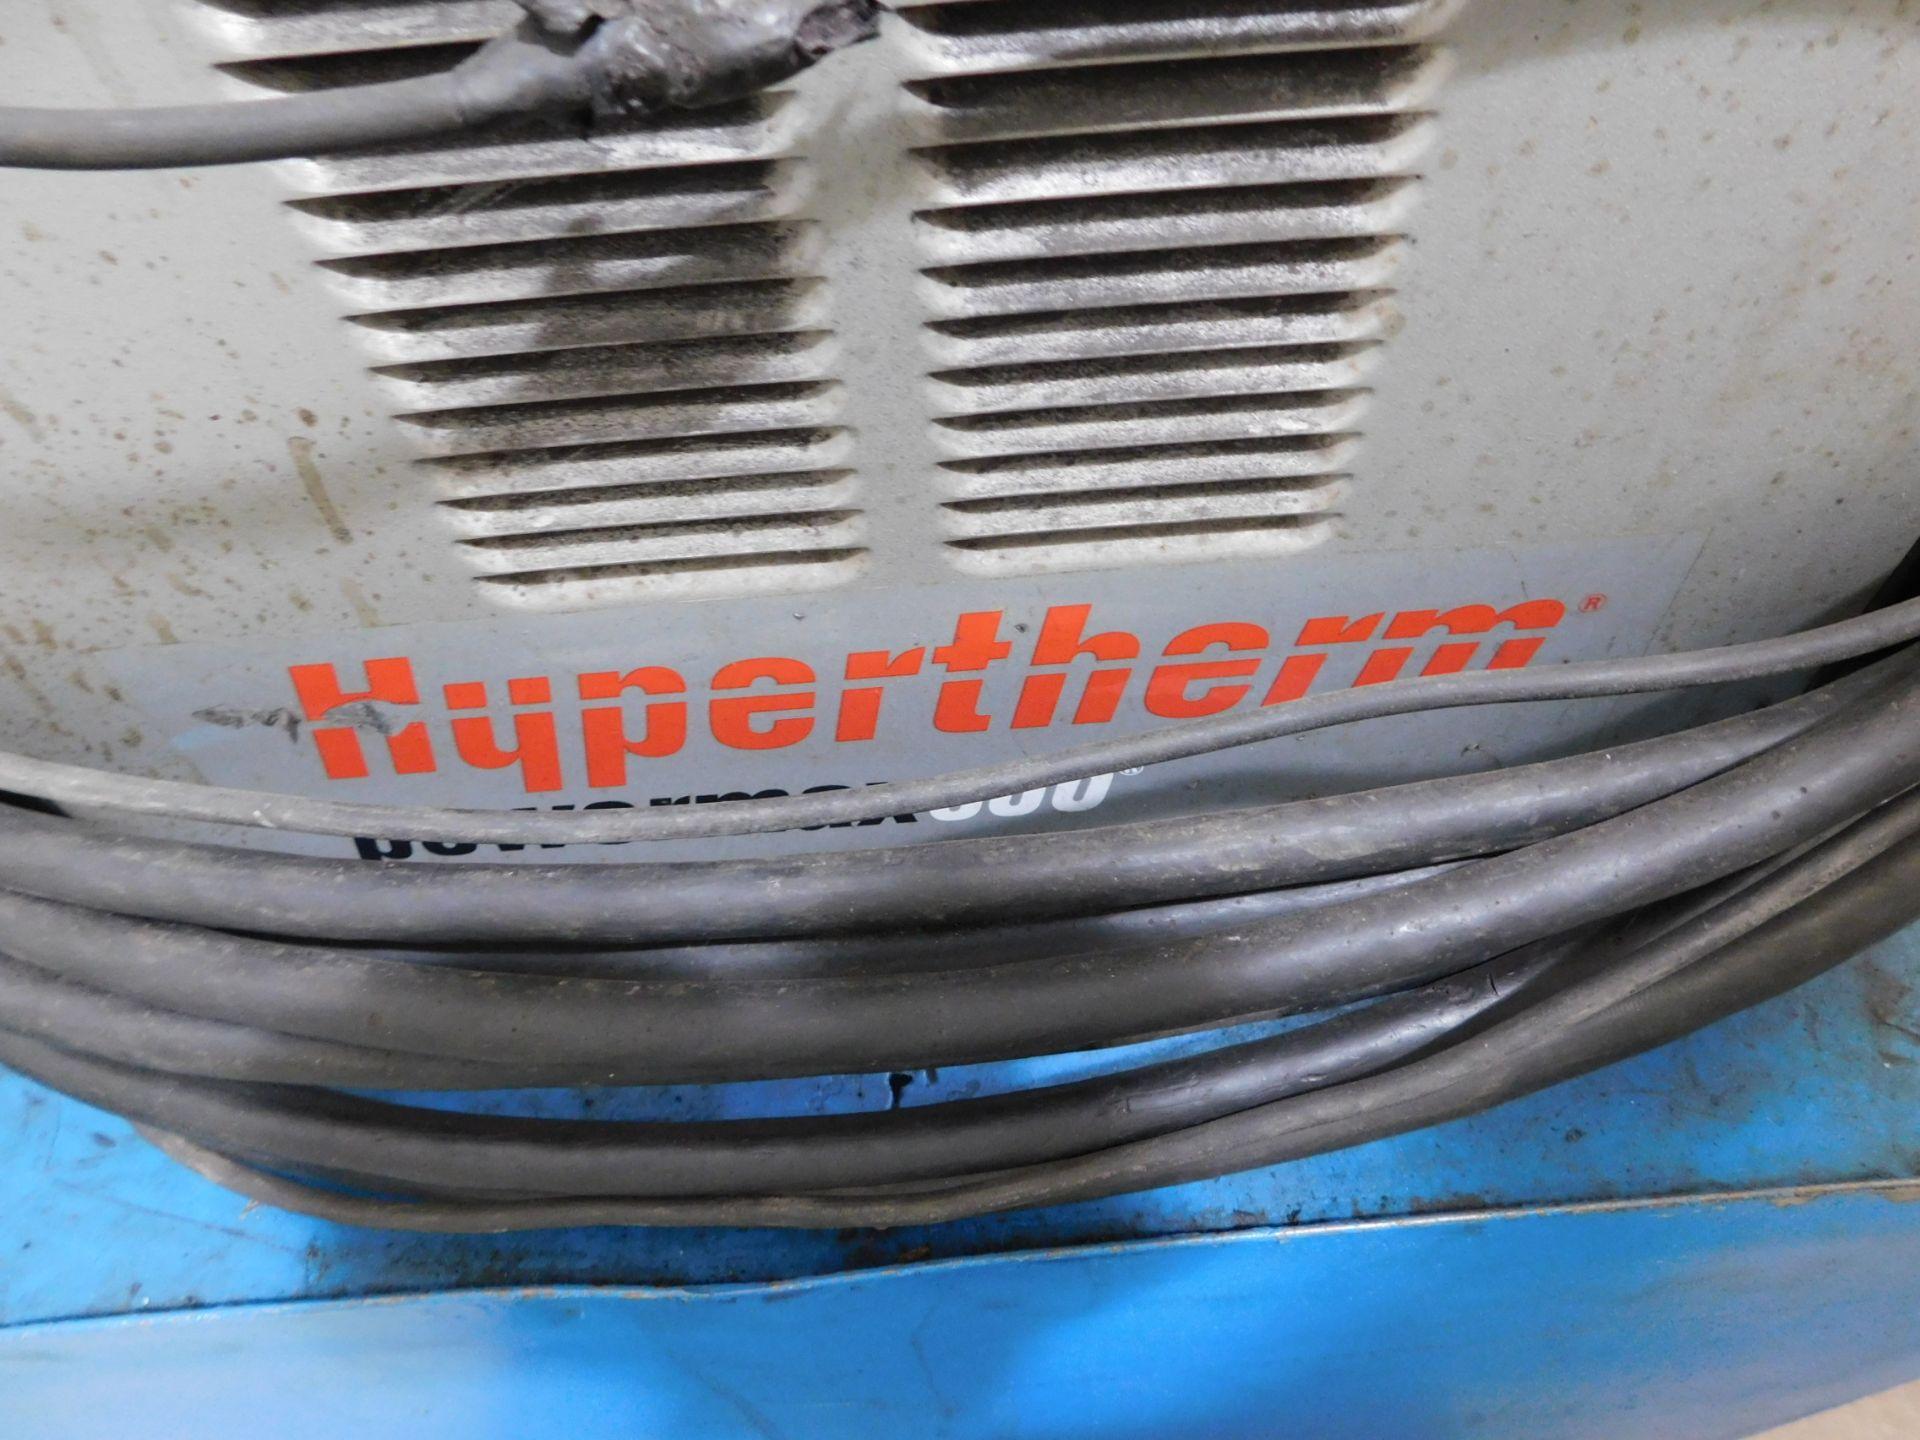 Hypertherm Model Powermax 600 Plasma Cutter, SN PMX600-037767, 230V, 1 phs. - Image 4 of 4